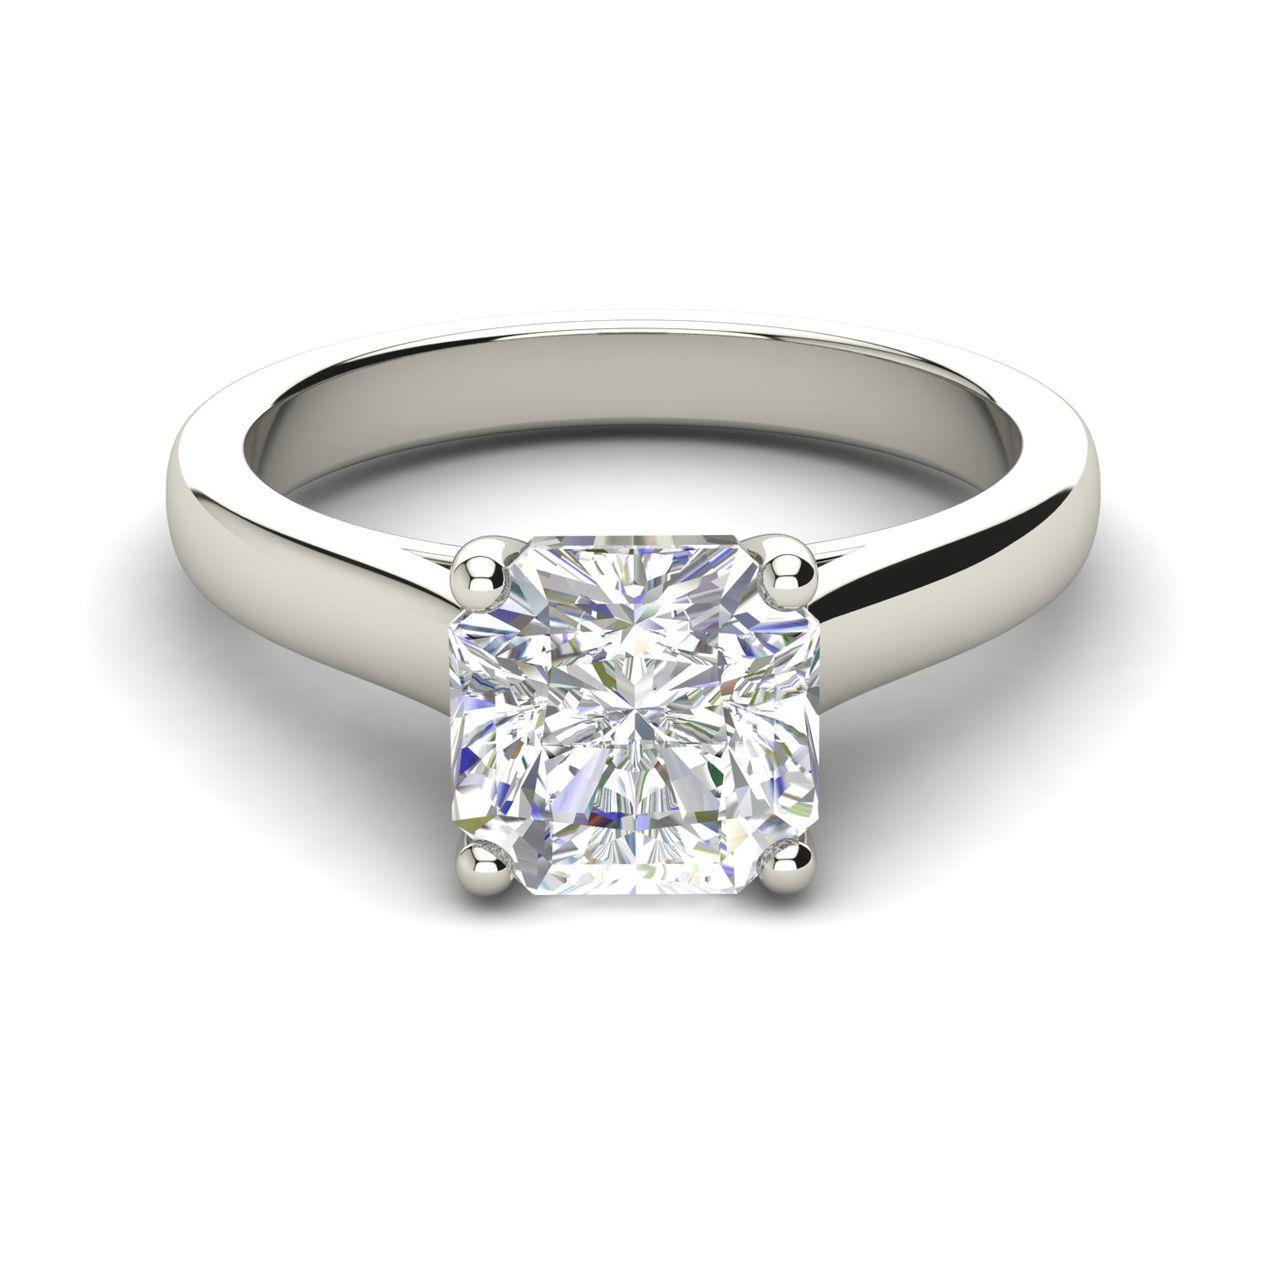 Solitaire 1 Carat Cushion Cut Diamond Engagement Ring